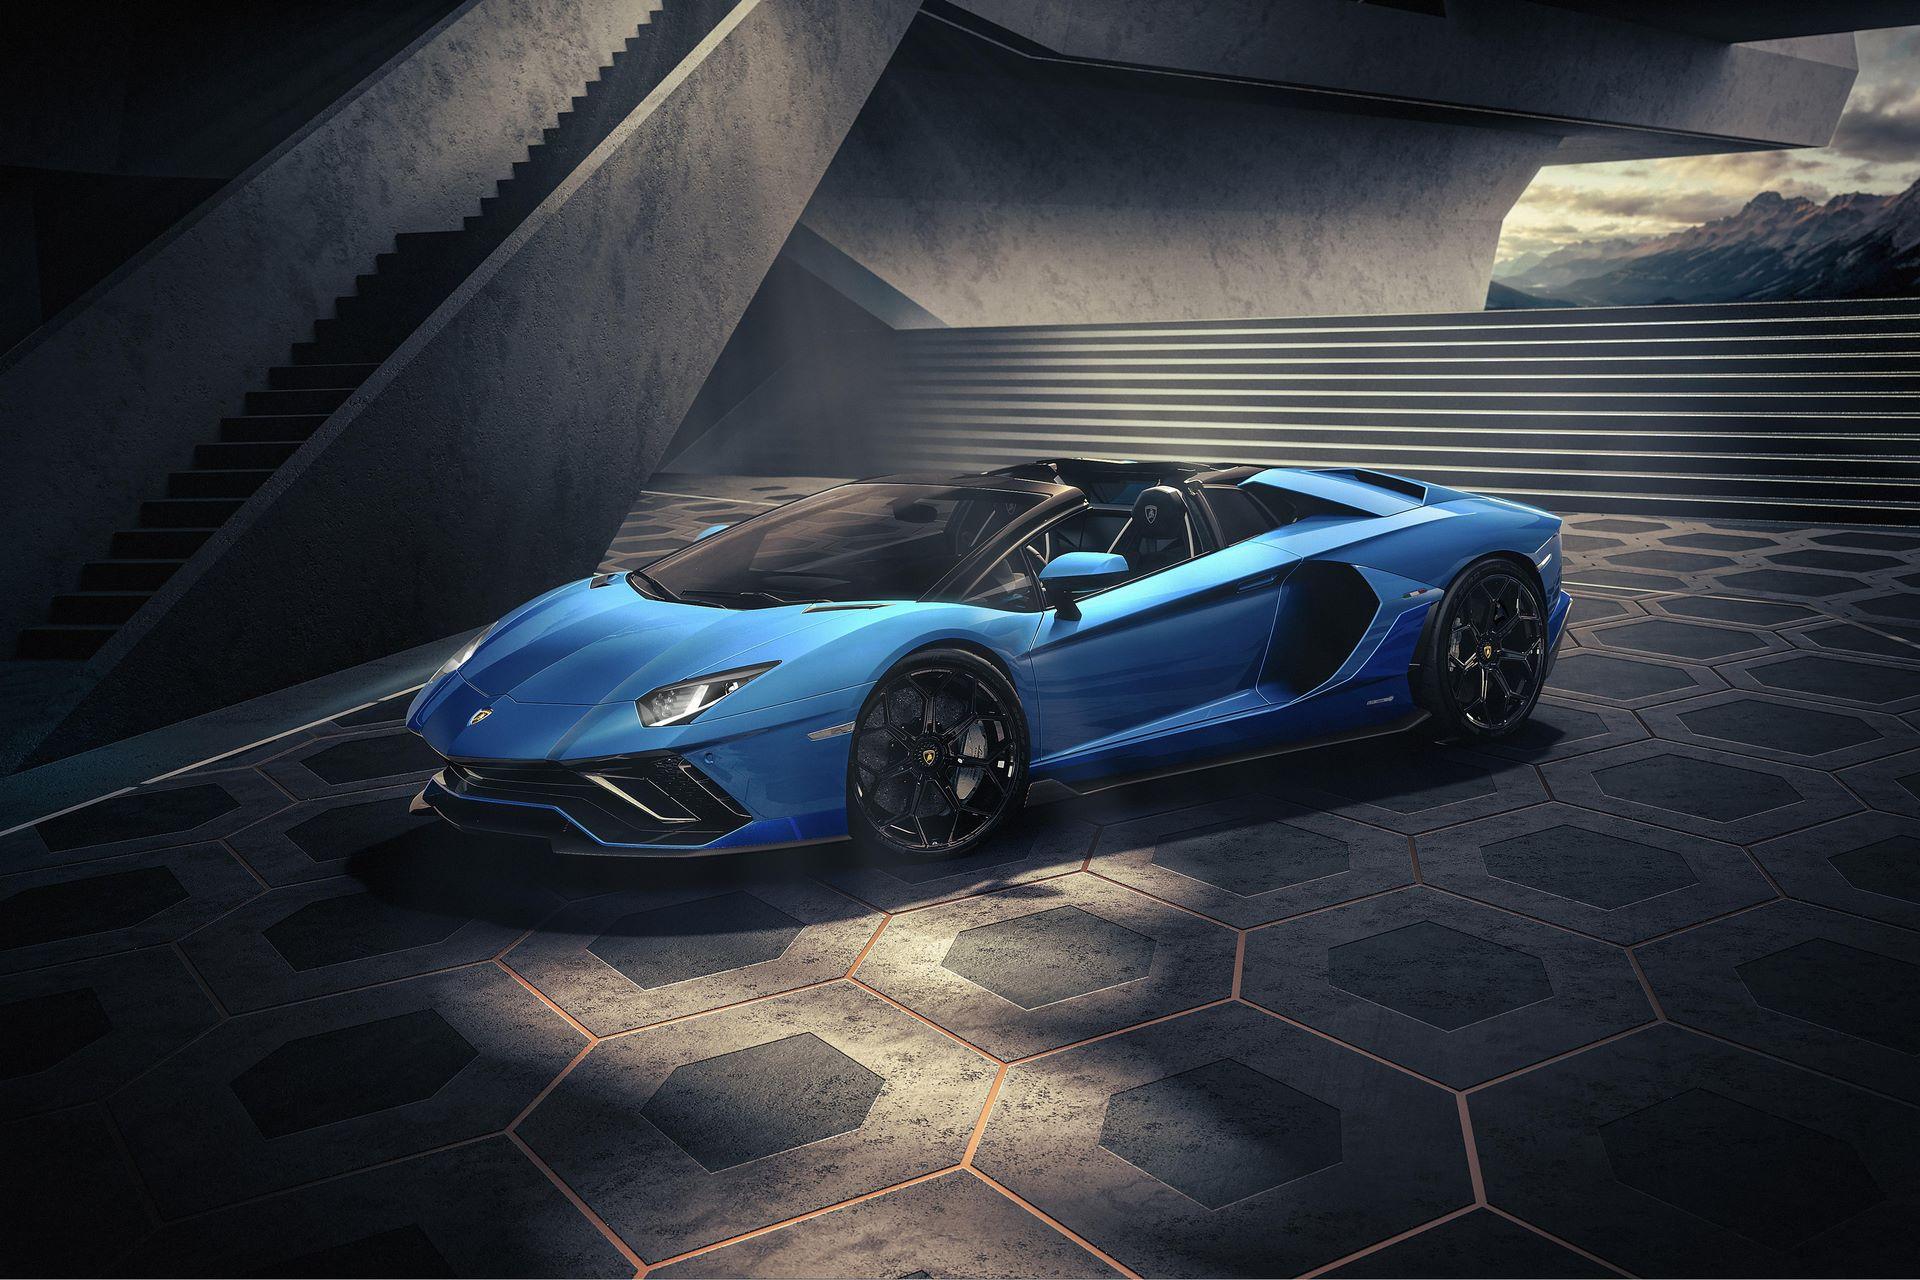 Lamborghini-Aventador-LP780-4-Ultimae-50